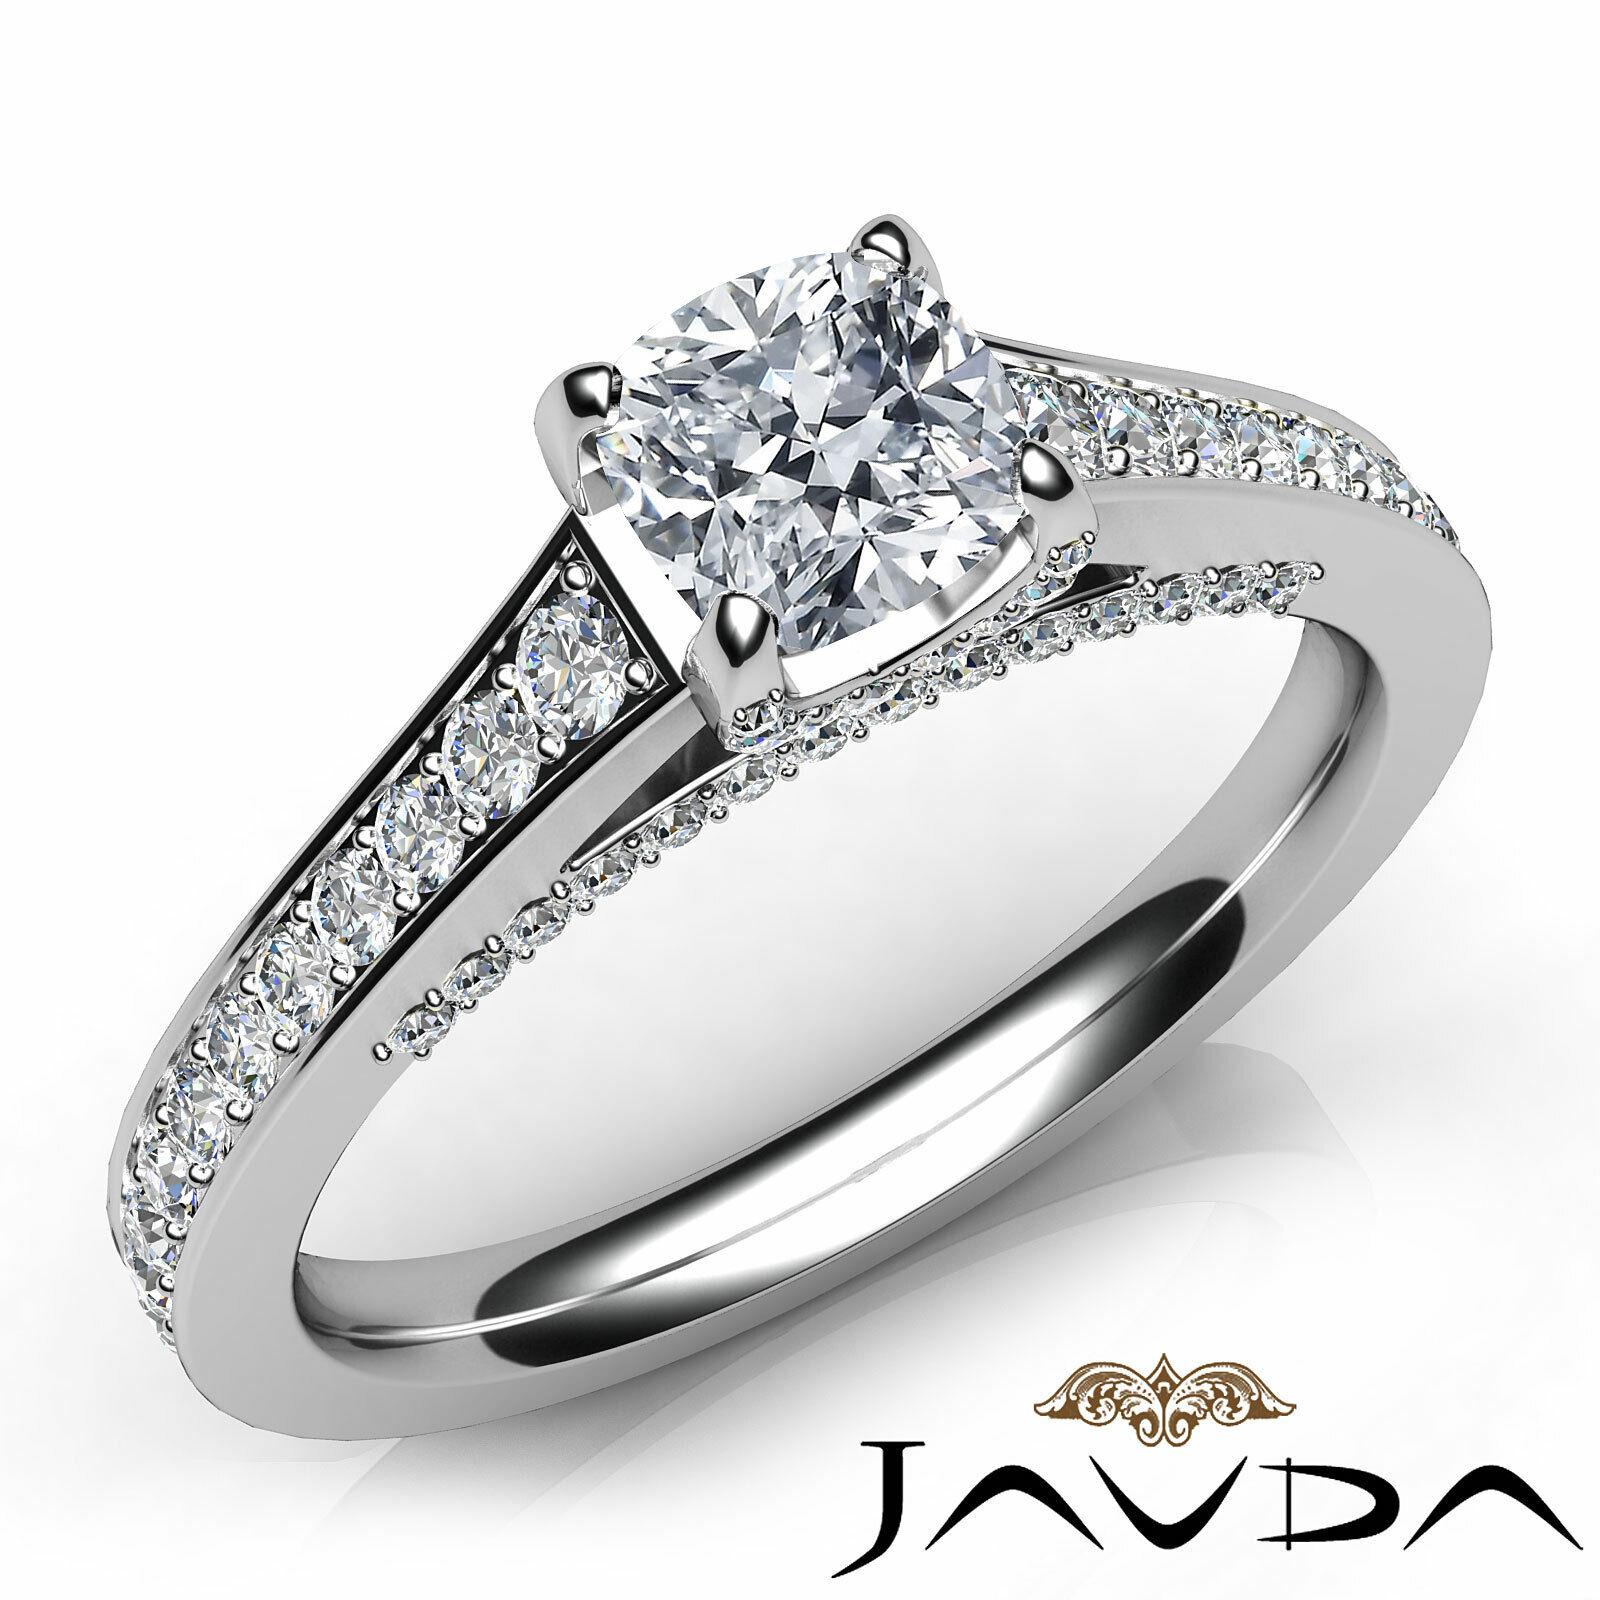 Bridge Accent Cushion Diamond Engagement Pave Set Ring GIA G VS1 Clarity 1.25Ct